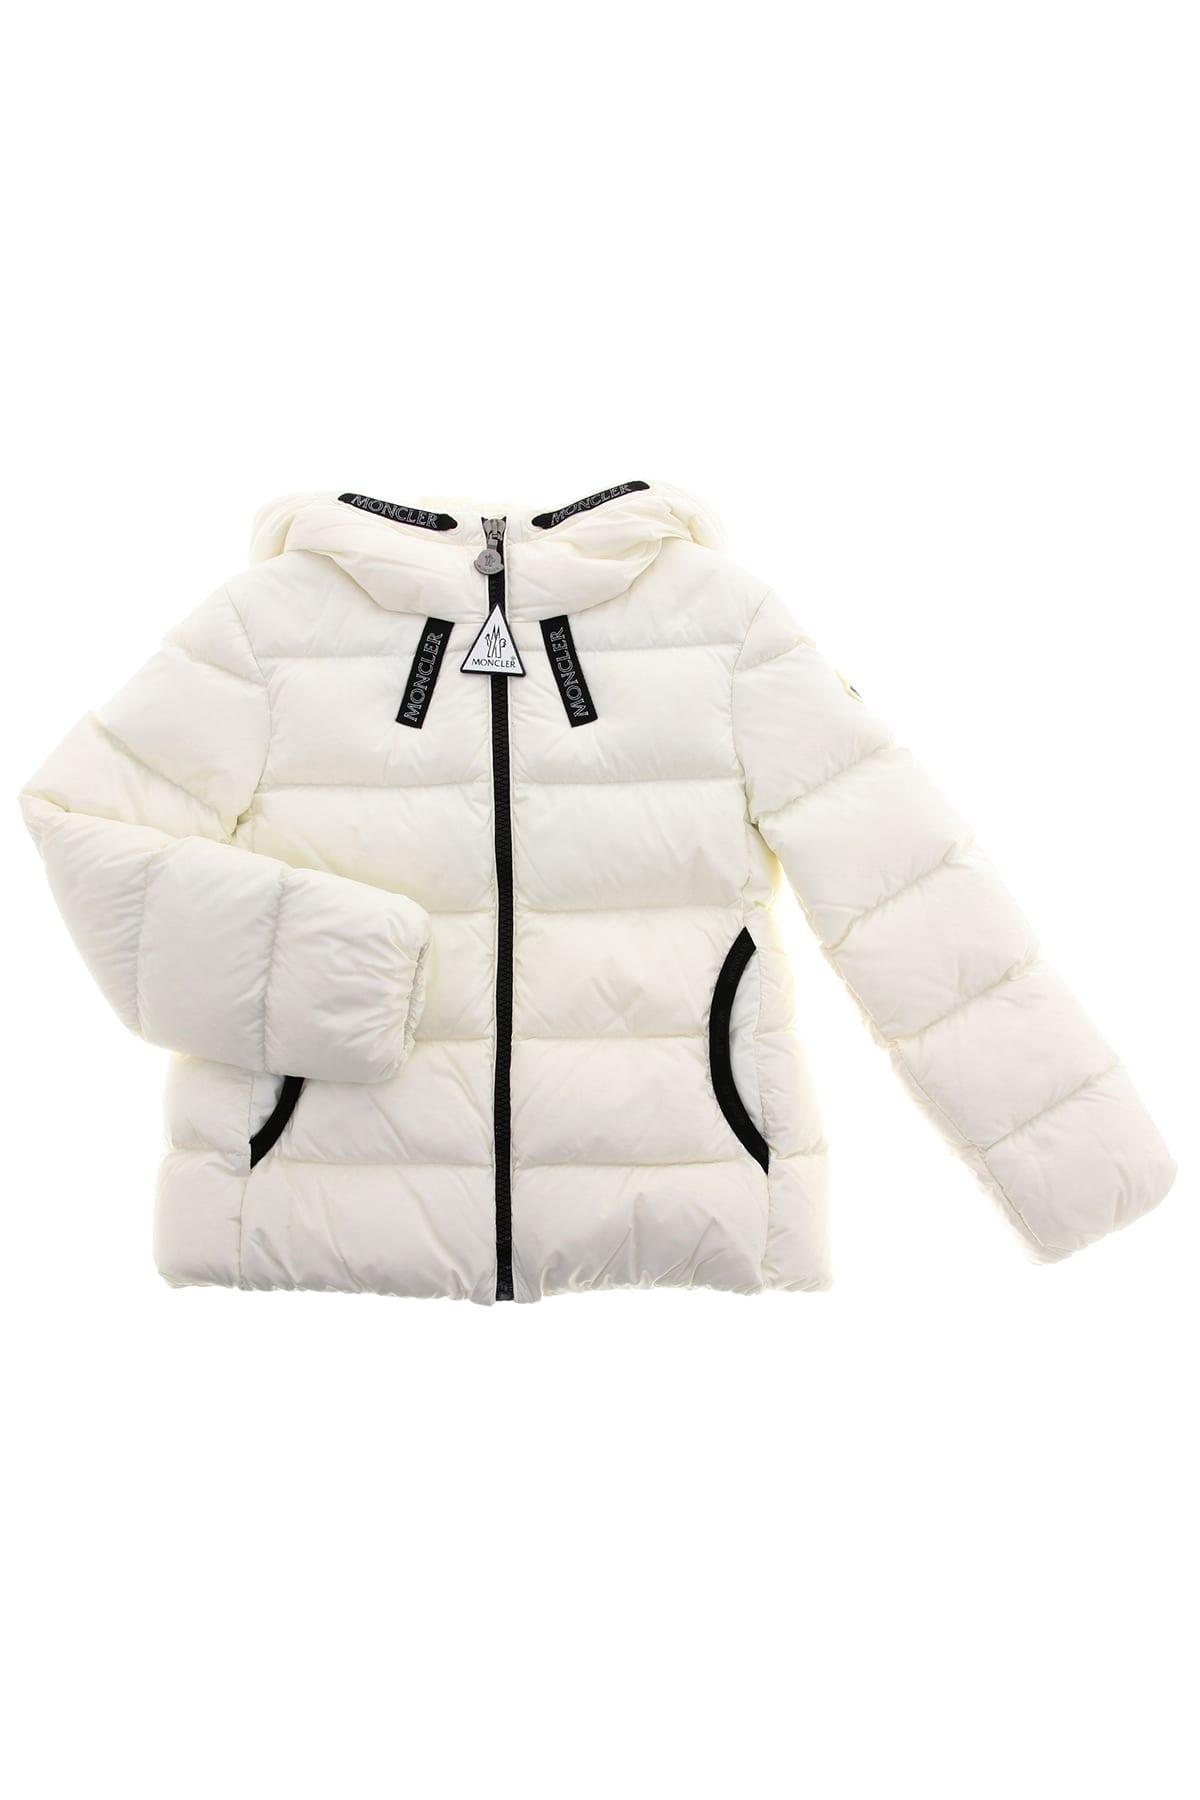 Moncler Kids' Chevril Down Jacket In Bianco